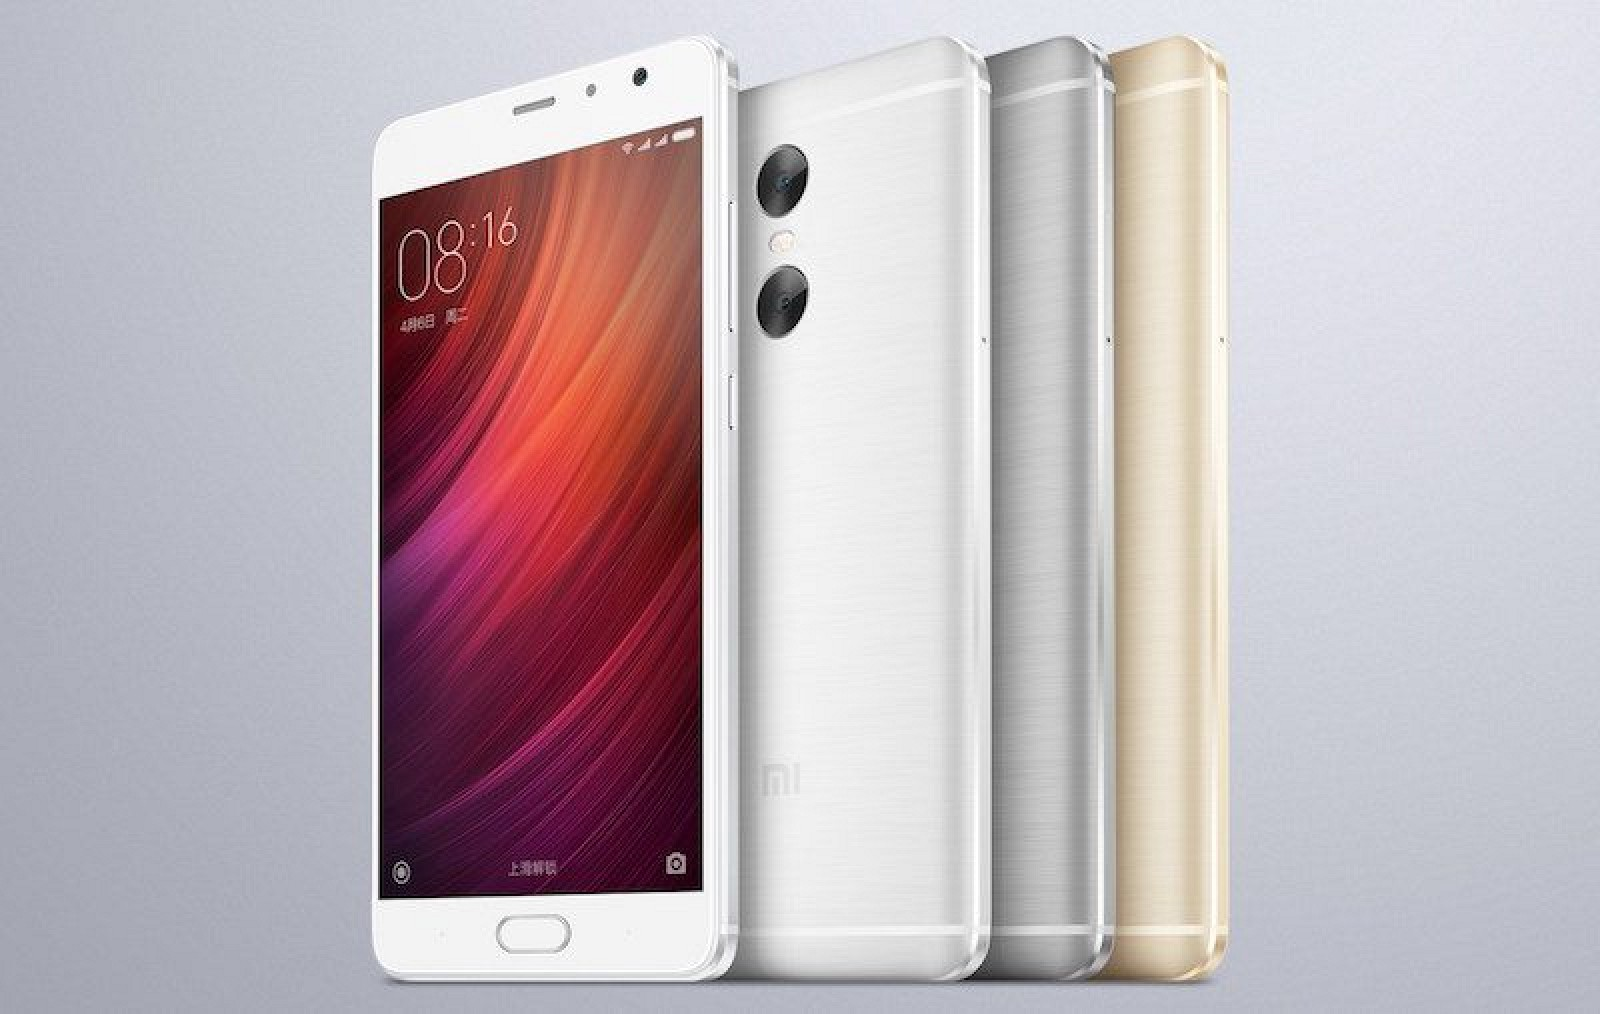 Xiaomi Announces 'Redmi Pro' Smartphone With 5.5-Inch OLED ...